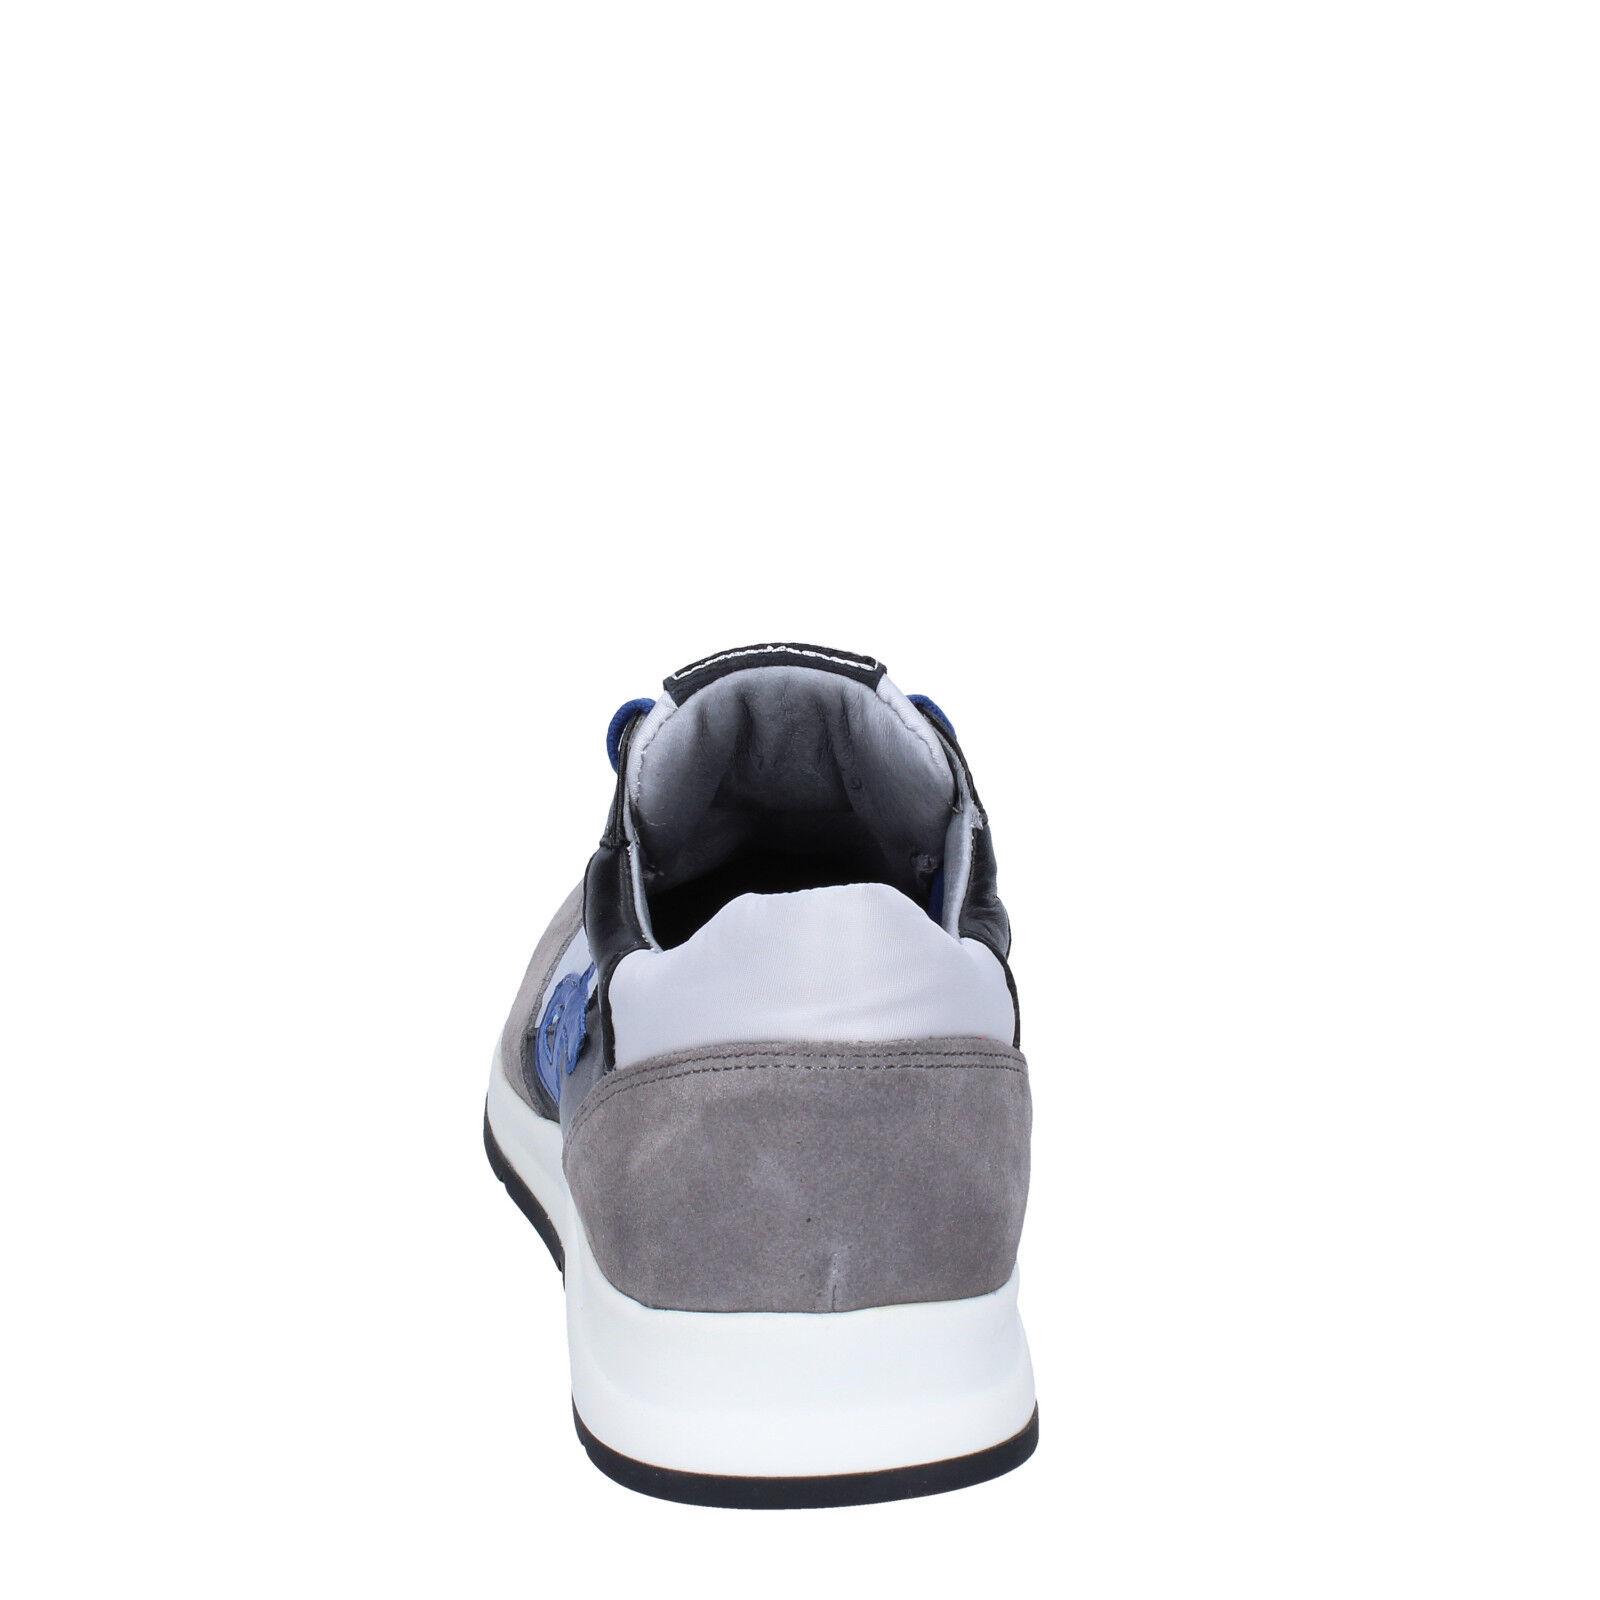 Scarpe Scarpe Scarpe uomo ROBERTO BOTTICELLI 43 scarpe da ginnastica grigio camoscio pelle BT541-43 5b3c66